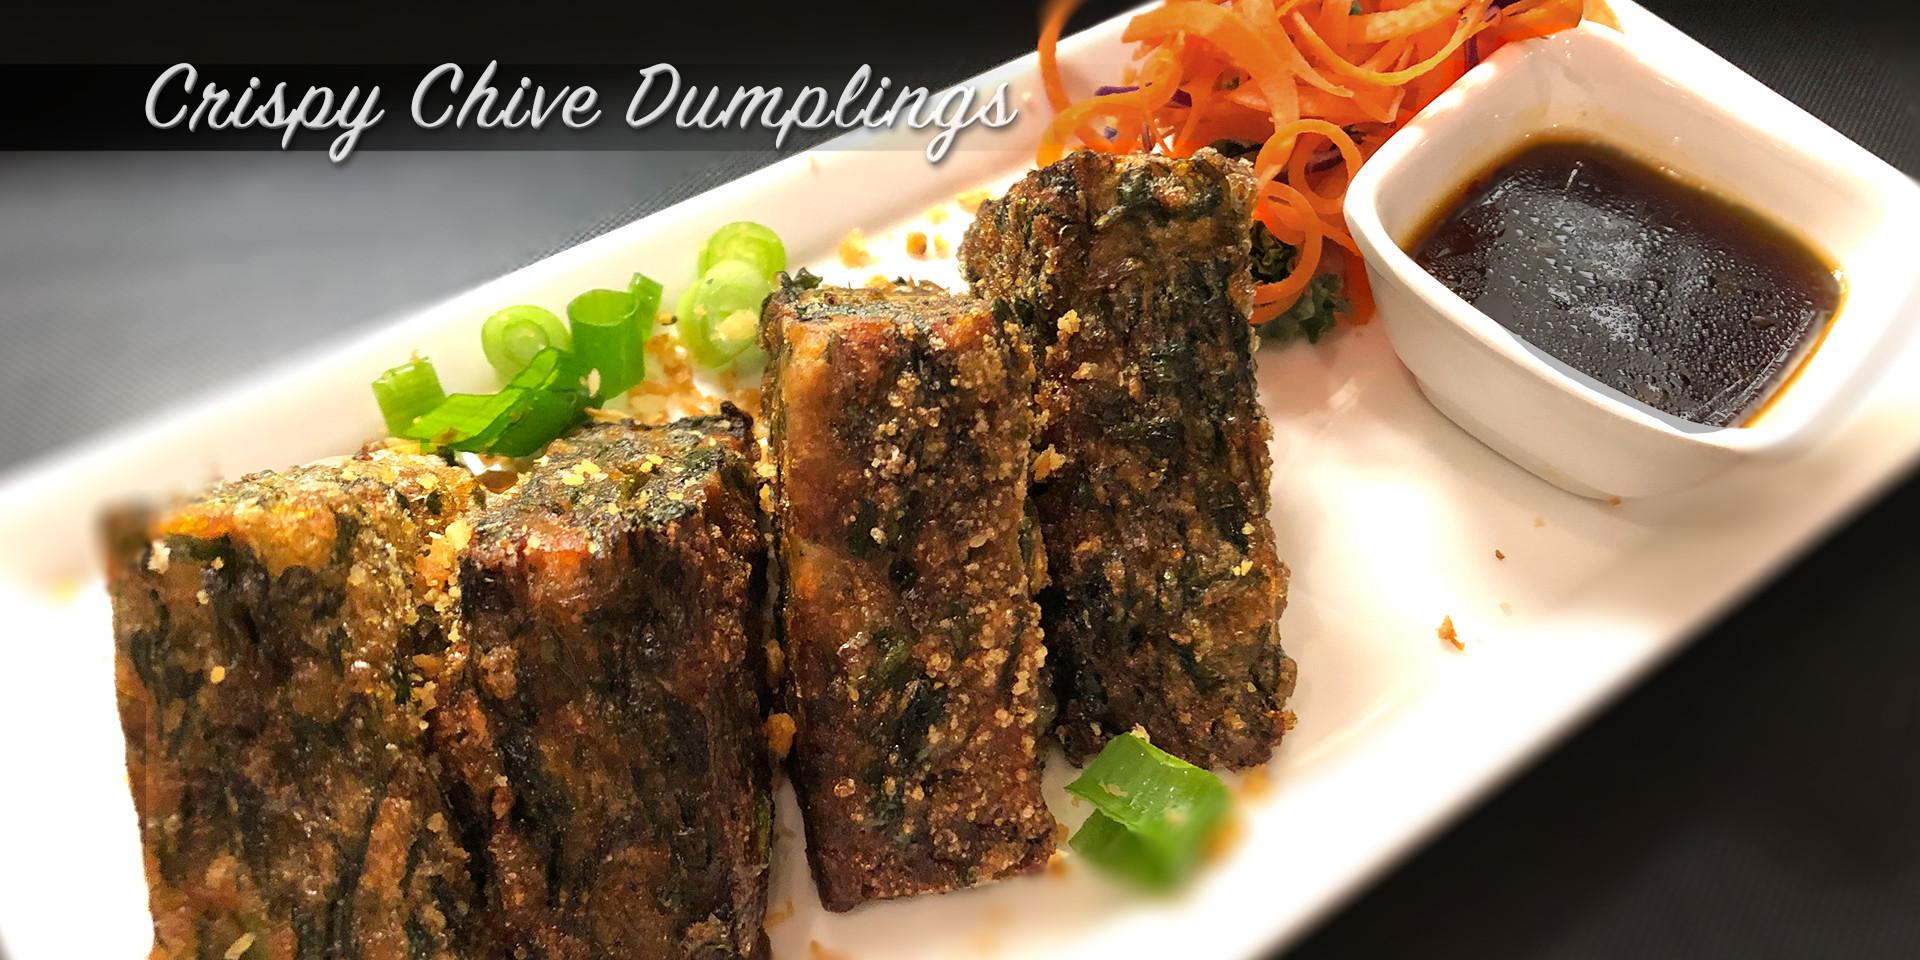 Crispy Chive Dumplings